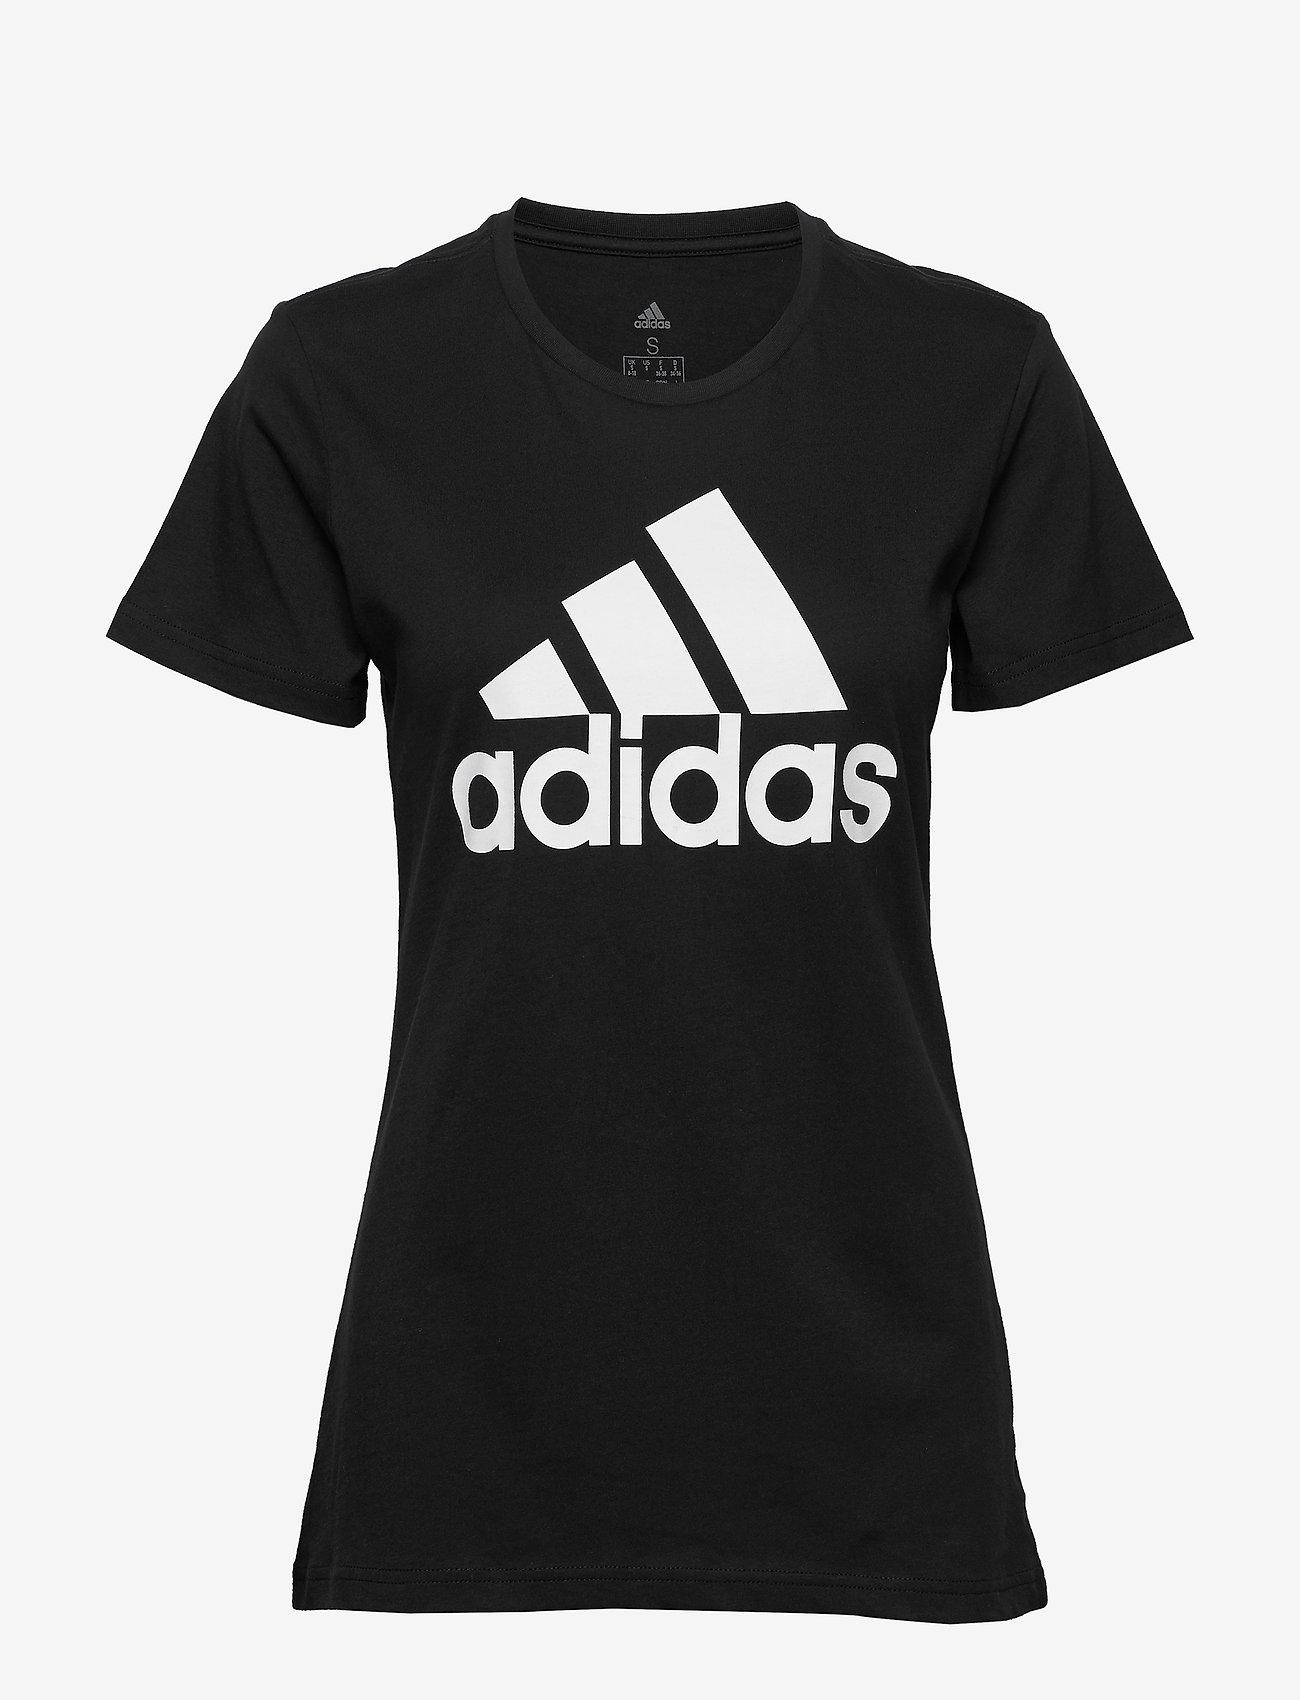 W Bos Co Tee (Black) - adidas Performance 0zhhyL